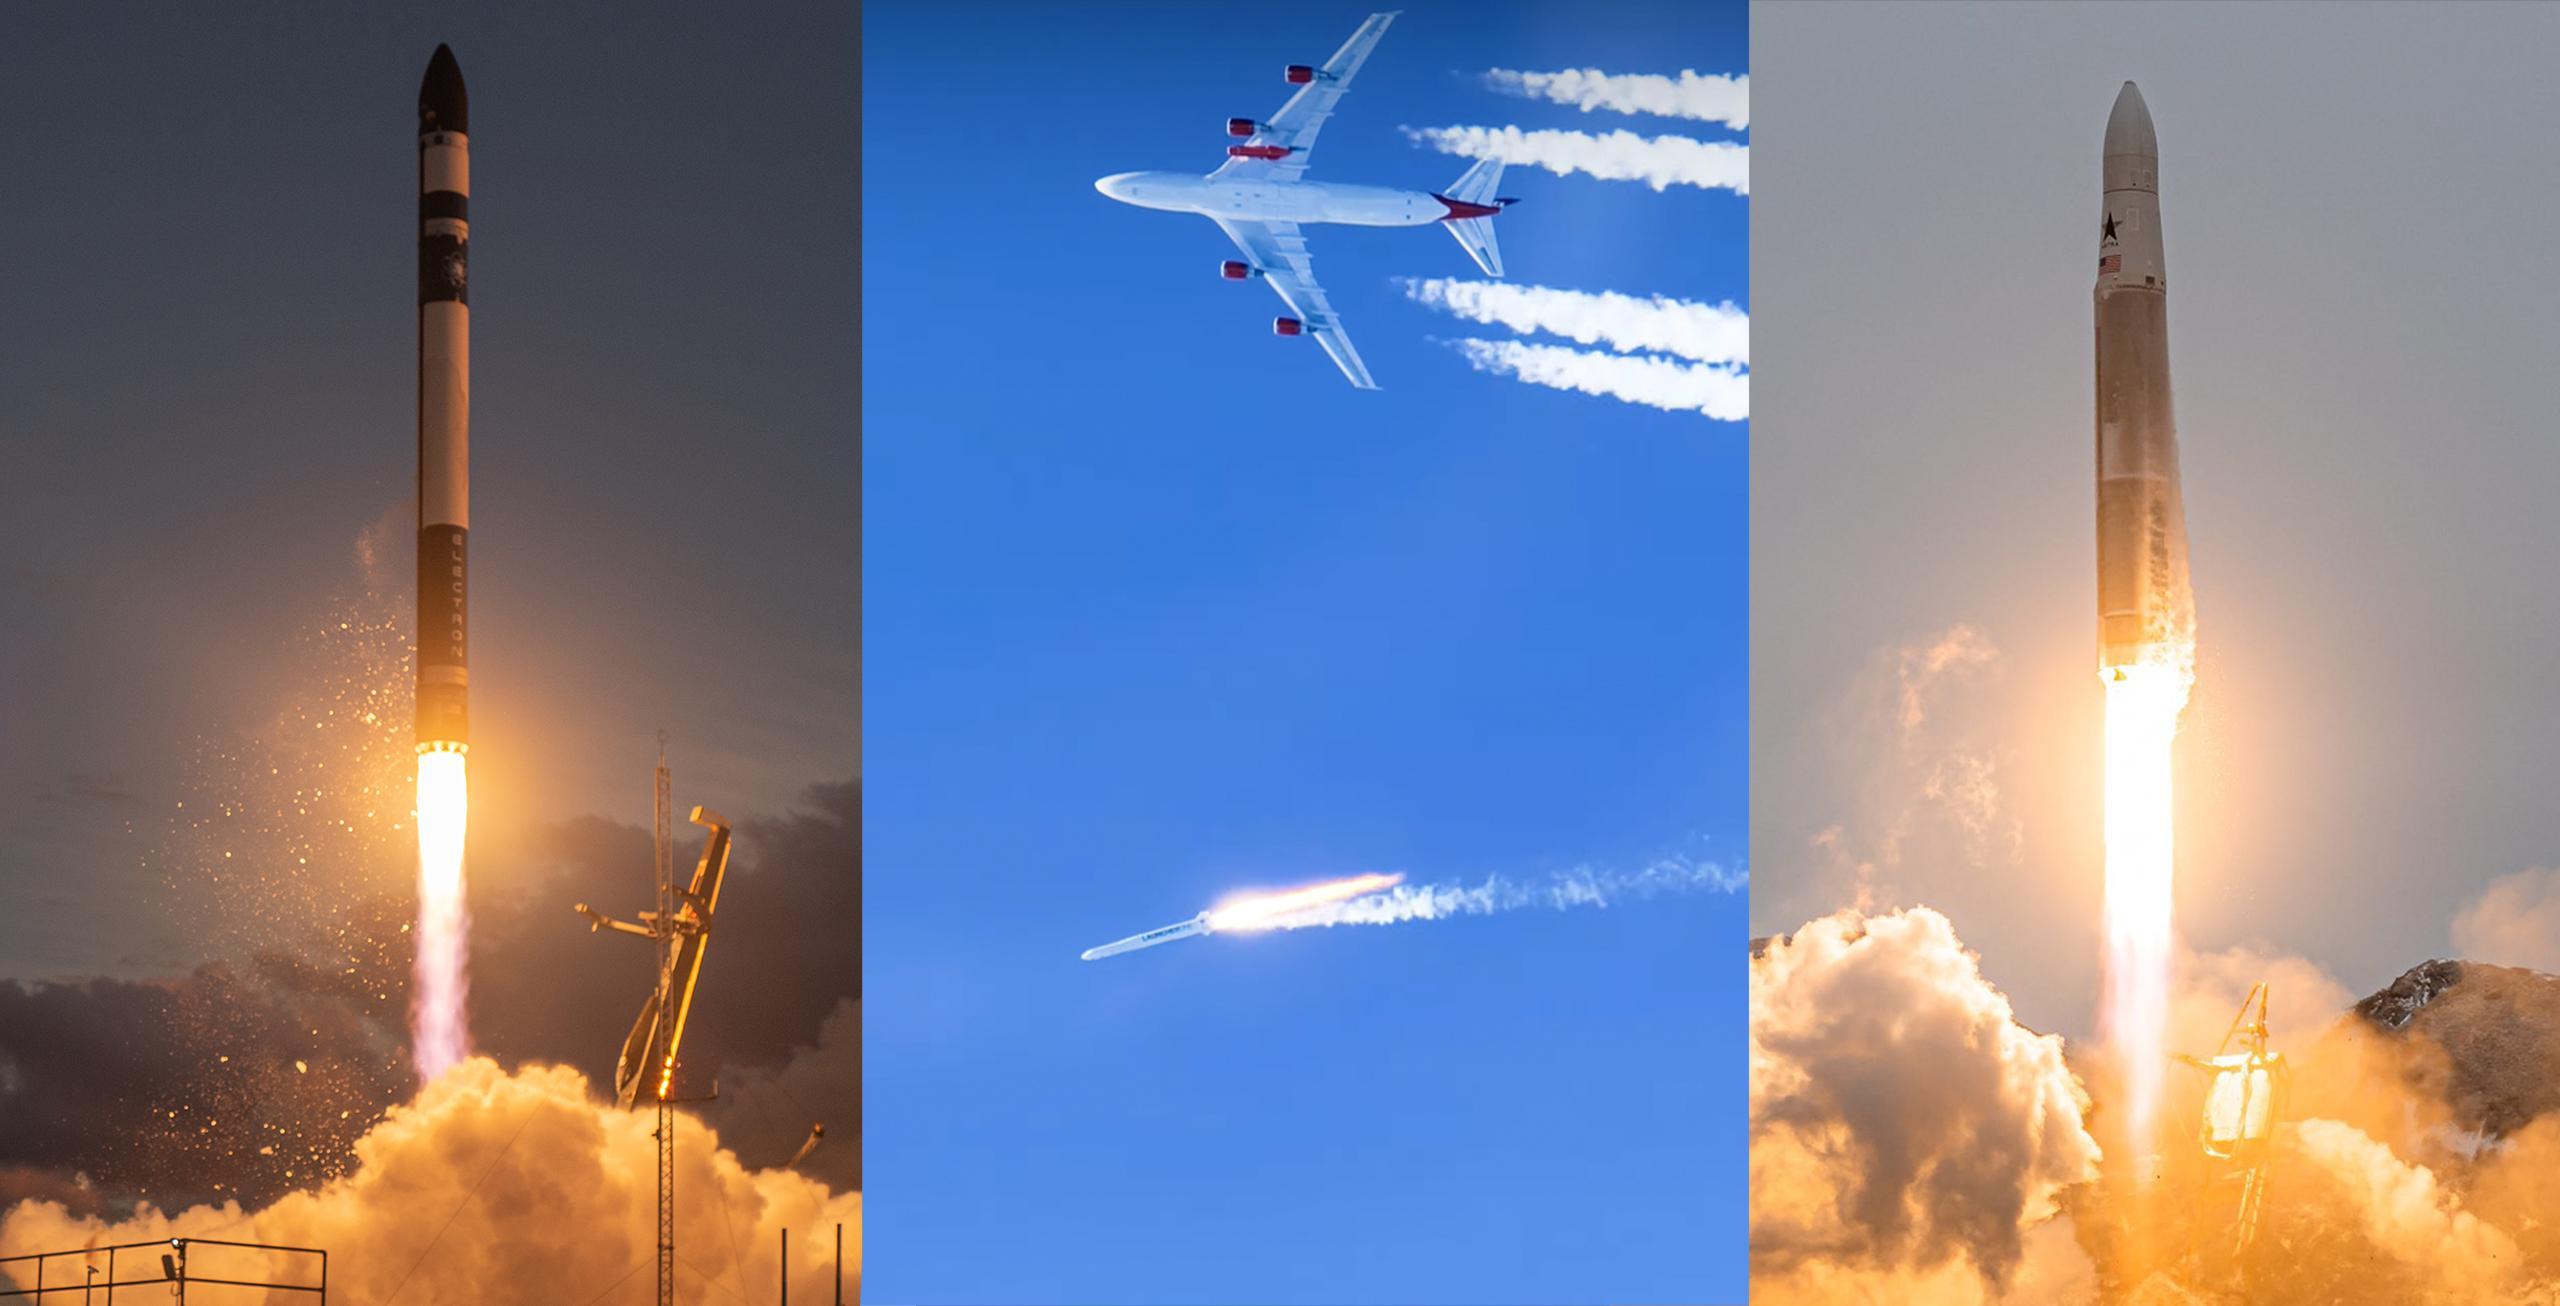 Rocket 3.2 LauncherOne Flight 2 Electron Flight 18 Dec-Jan 1 (c)